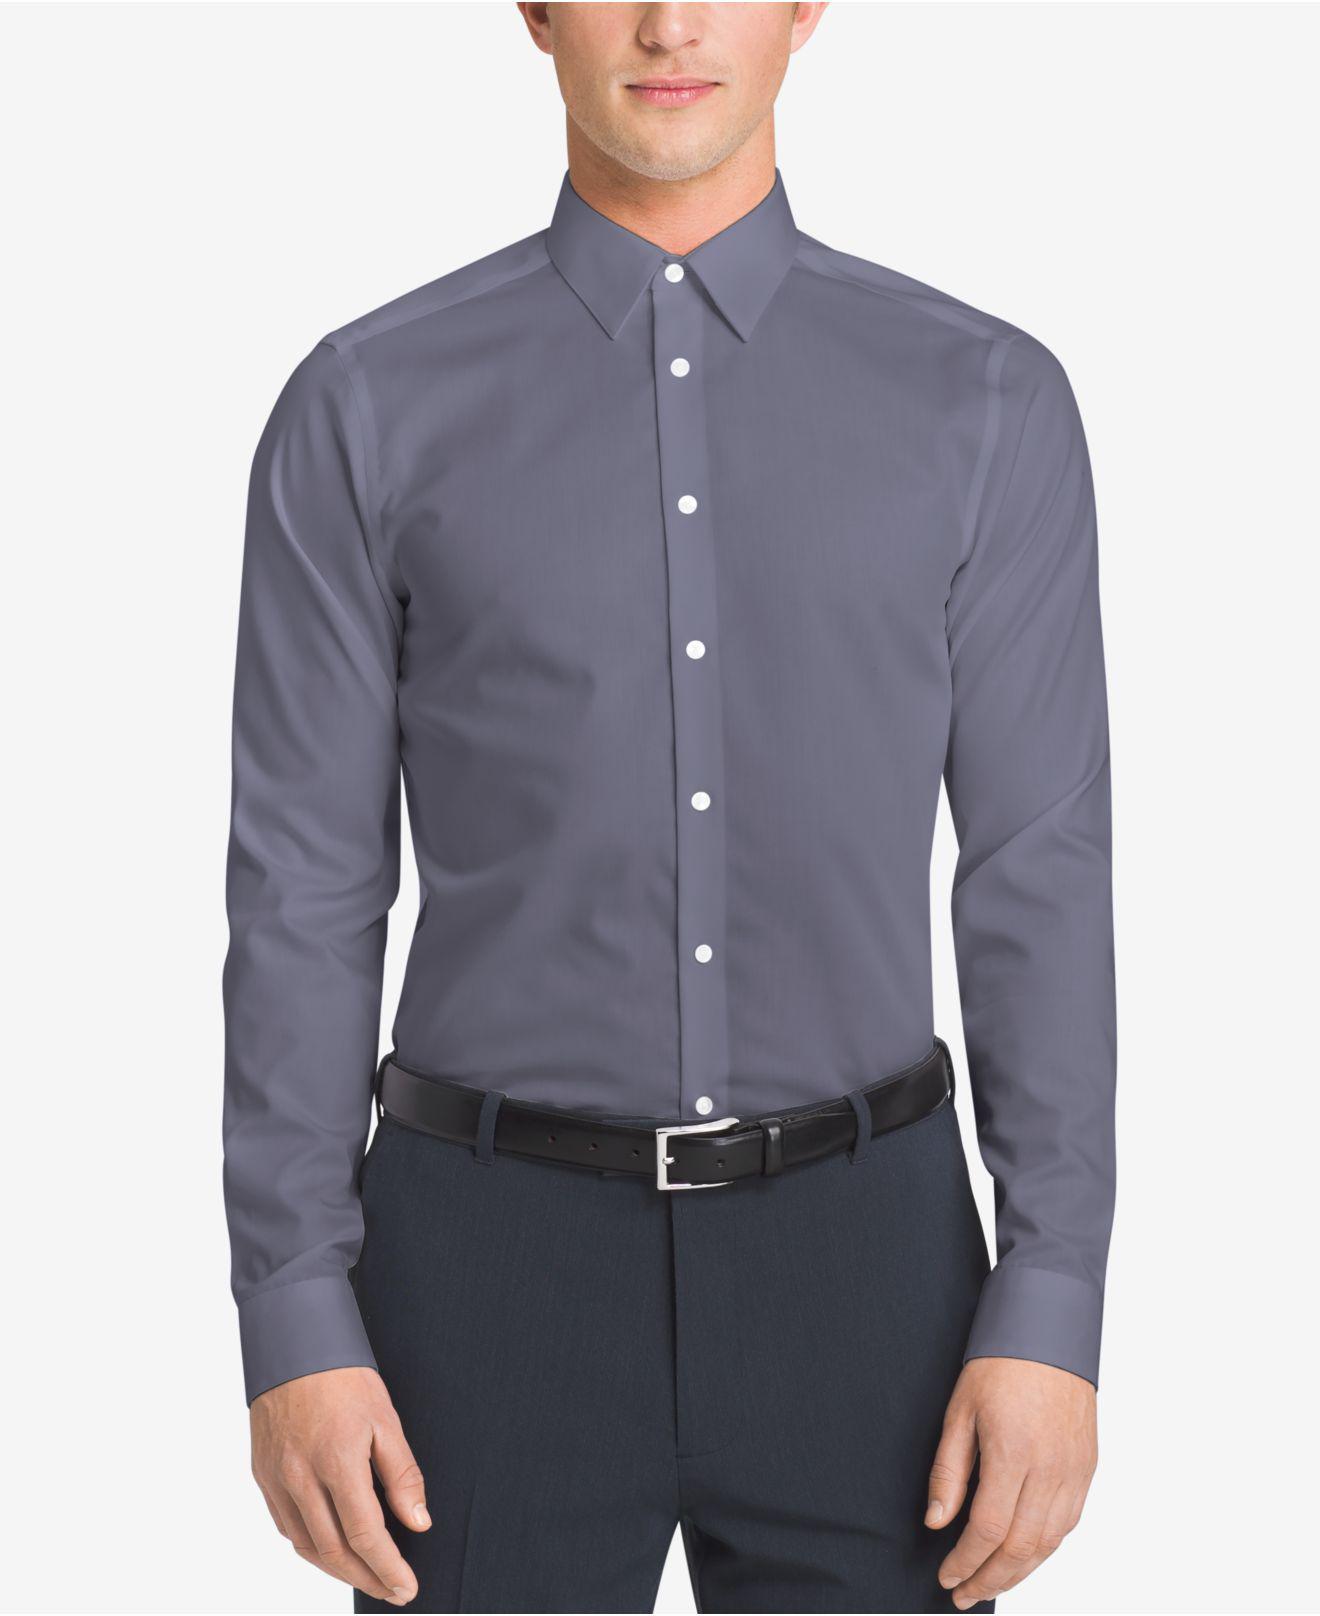 0703304d Calvin Klein Men's Slim-fit Non-iron Performance Herringbone Dress ...